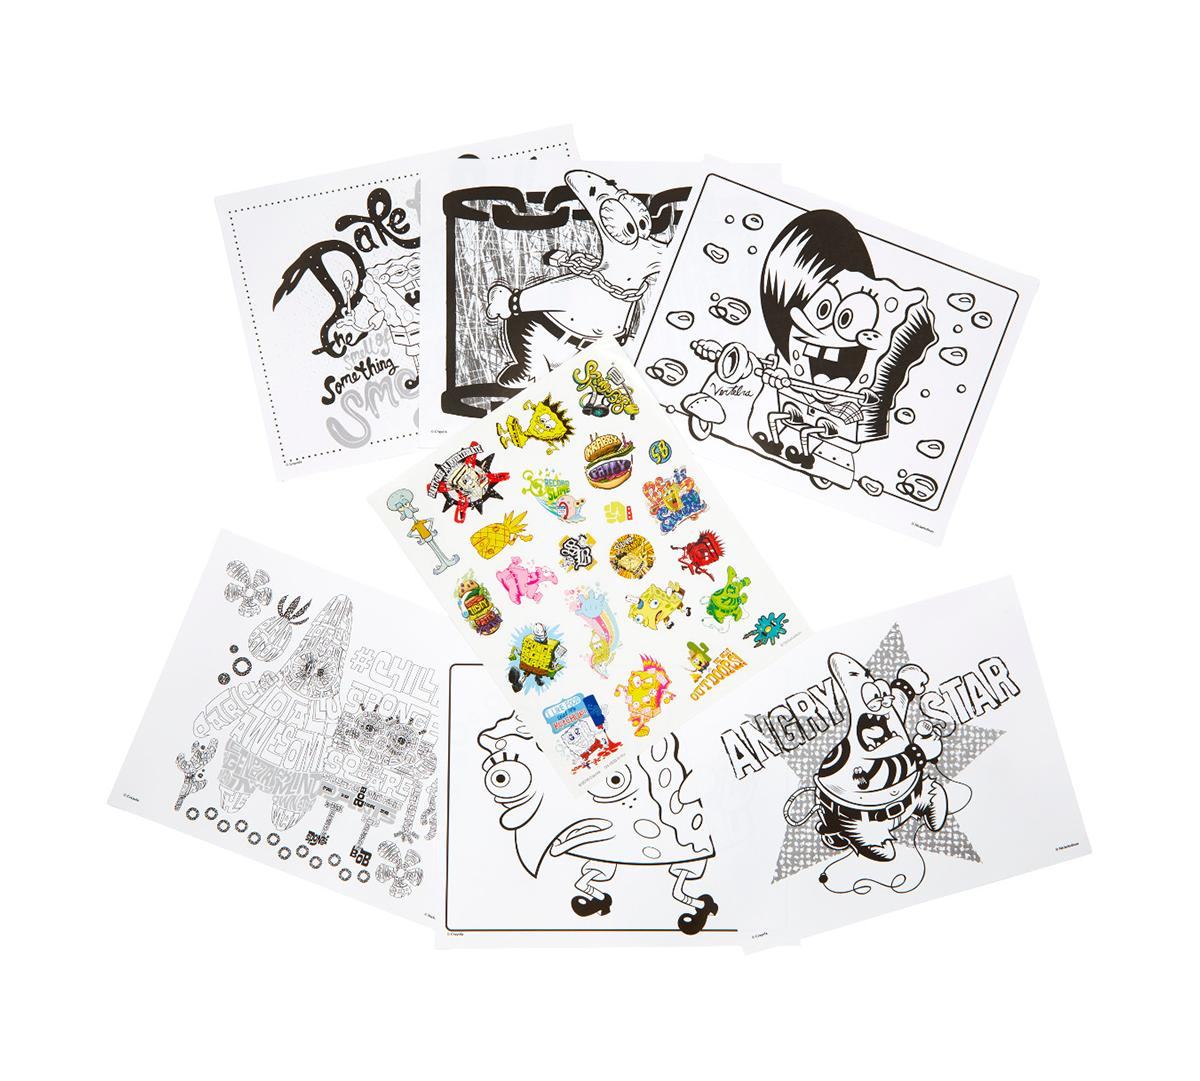 SpongeBob SquarePants Coloring Pages & Stickers Crayola.com Crayola